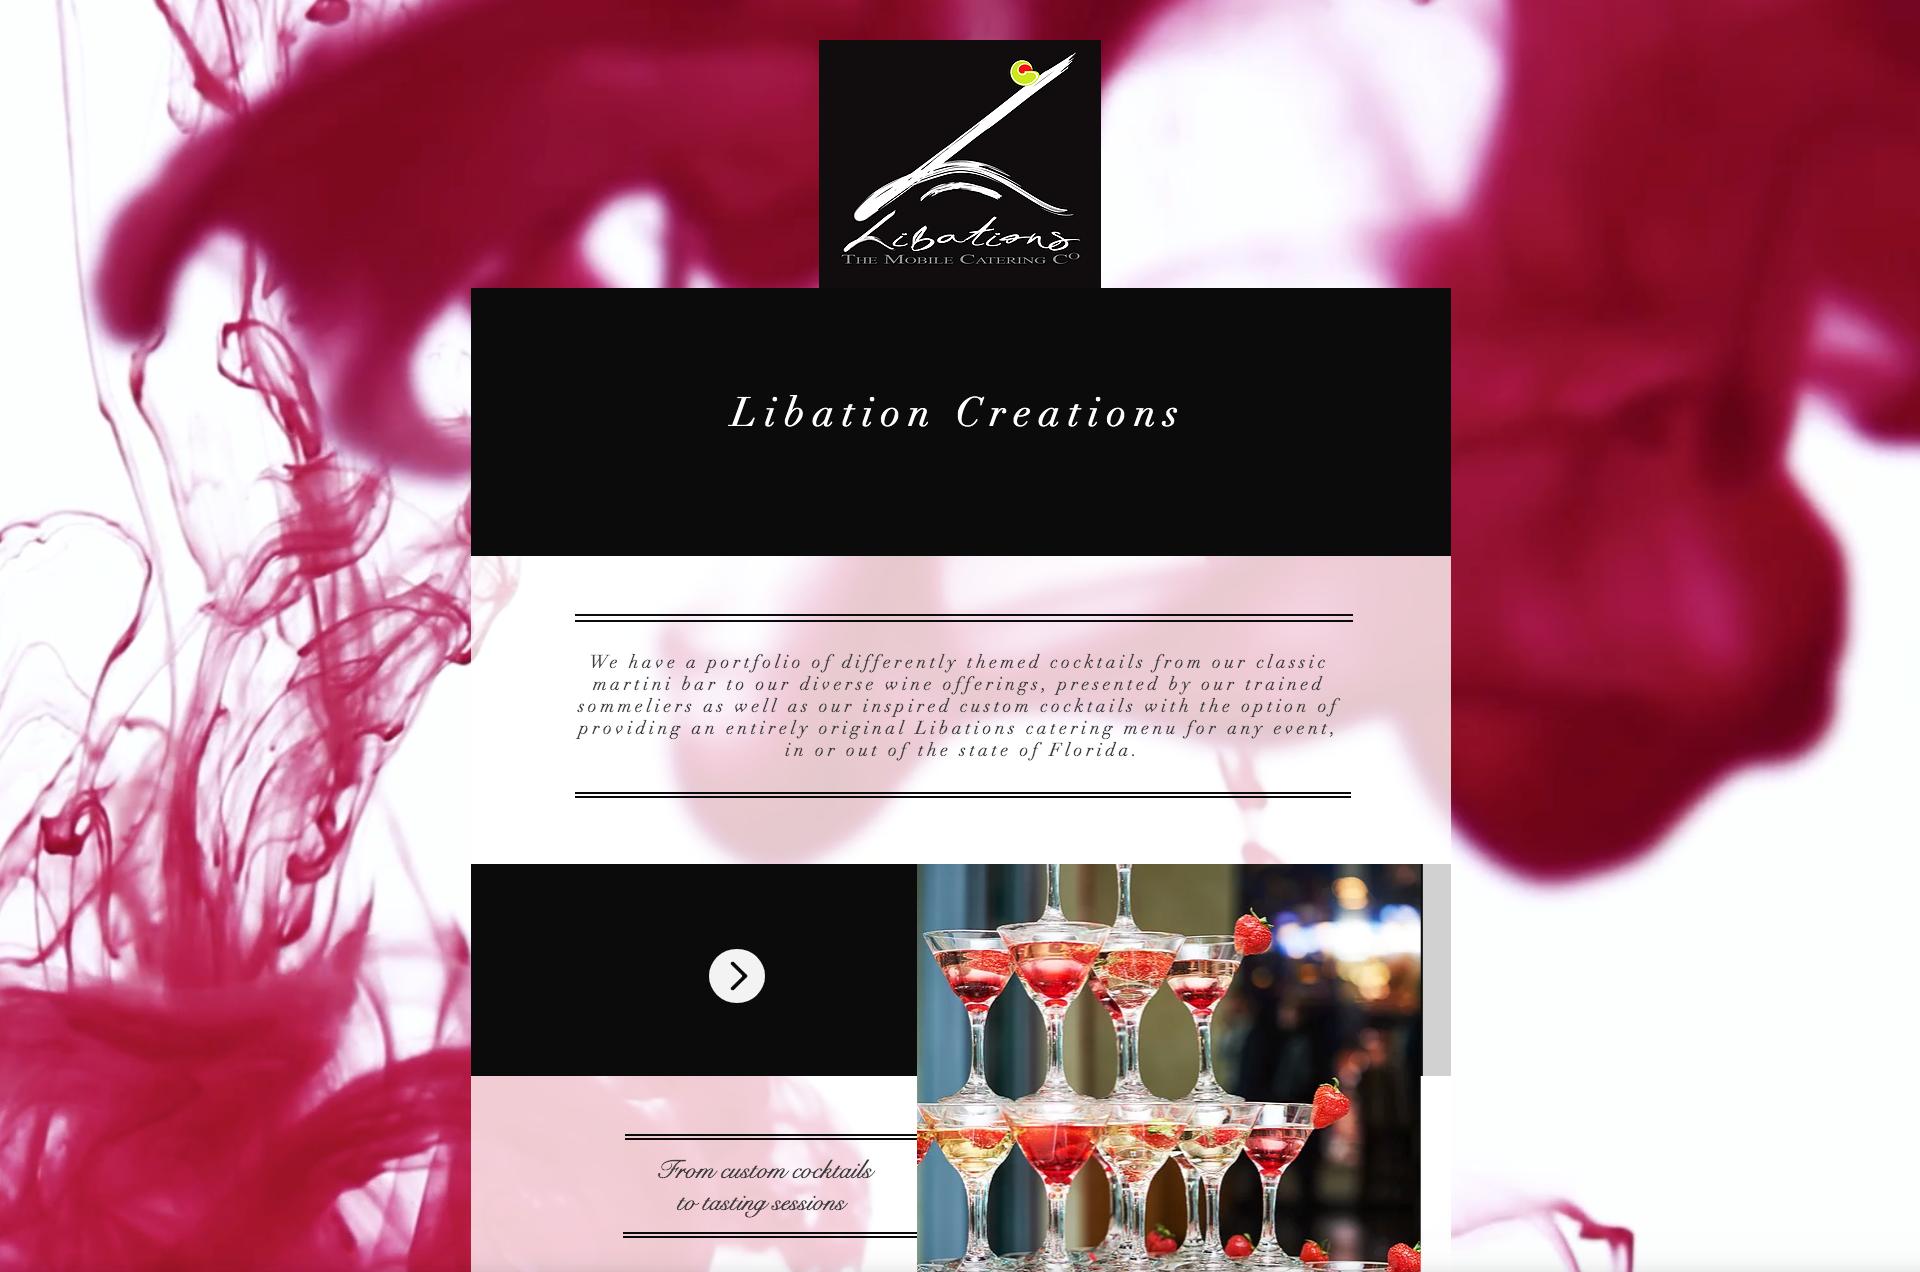 Libations Creations